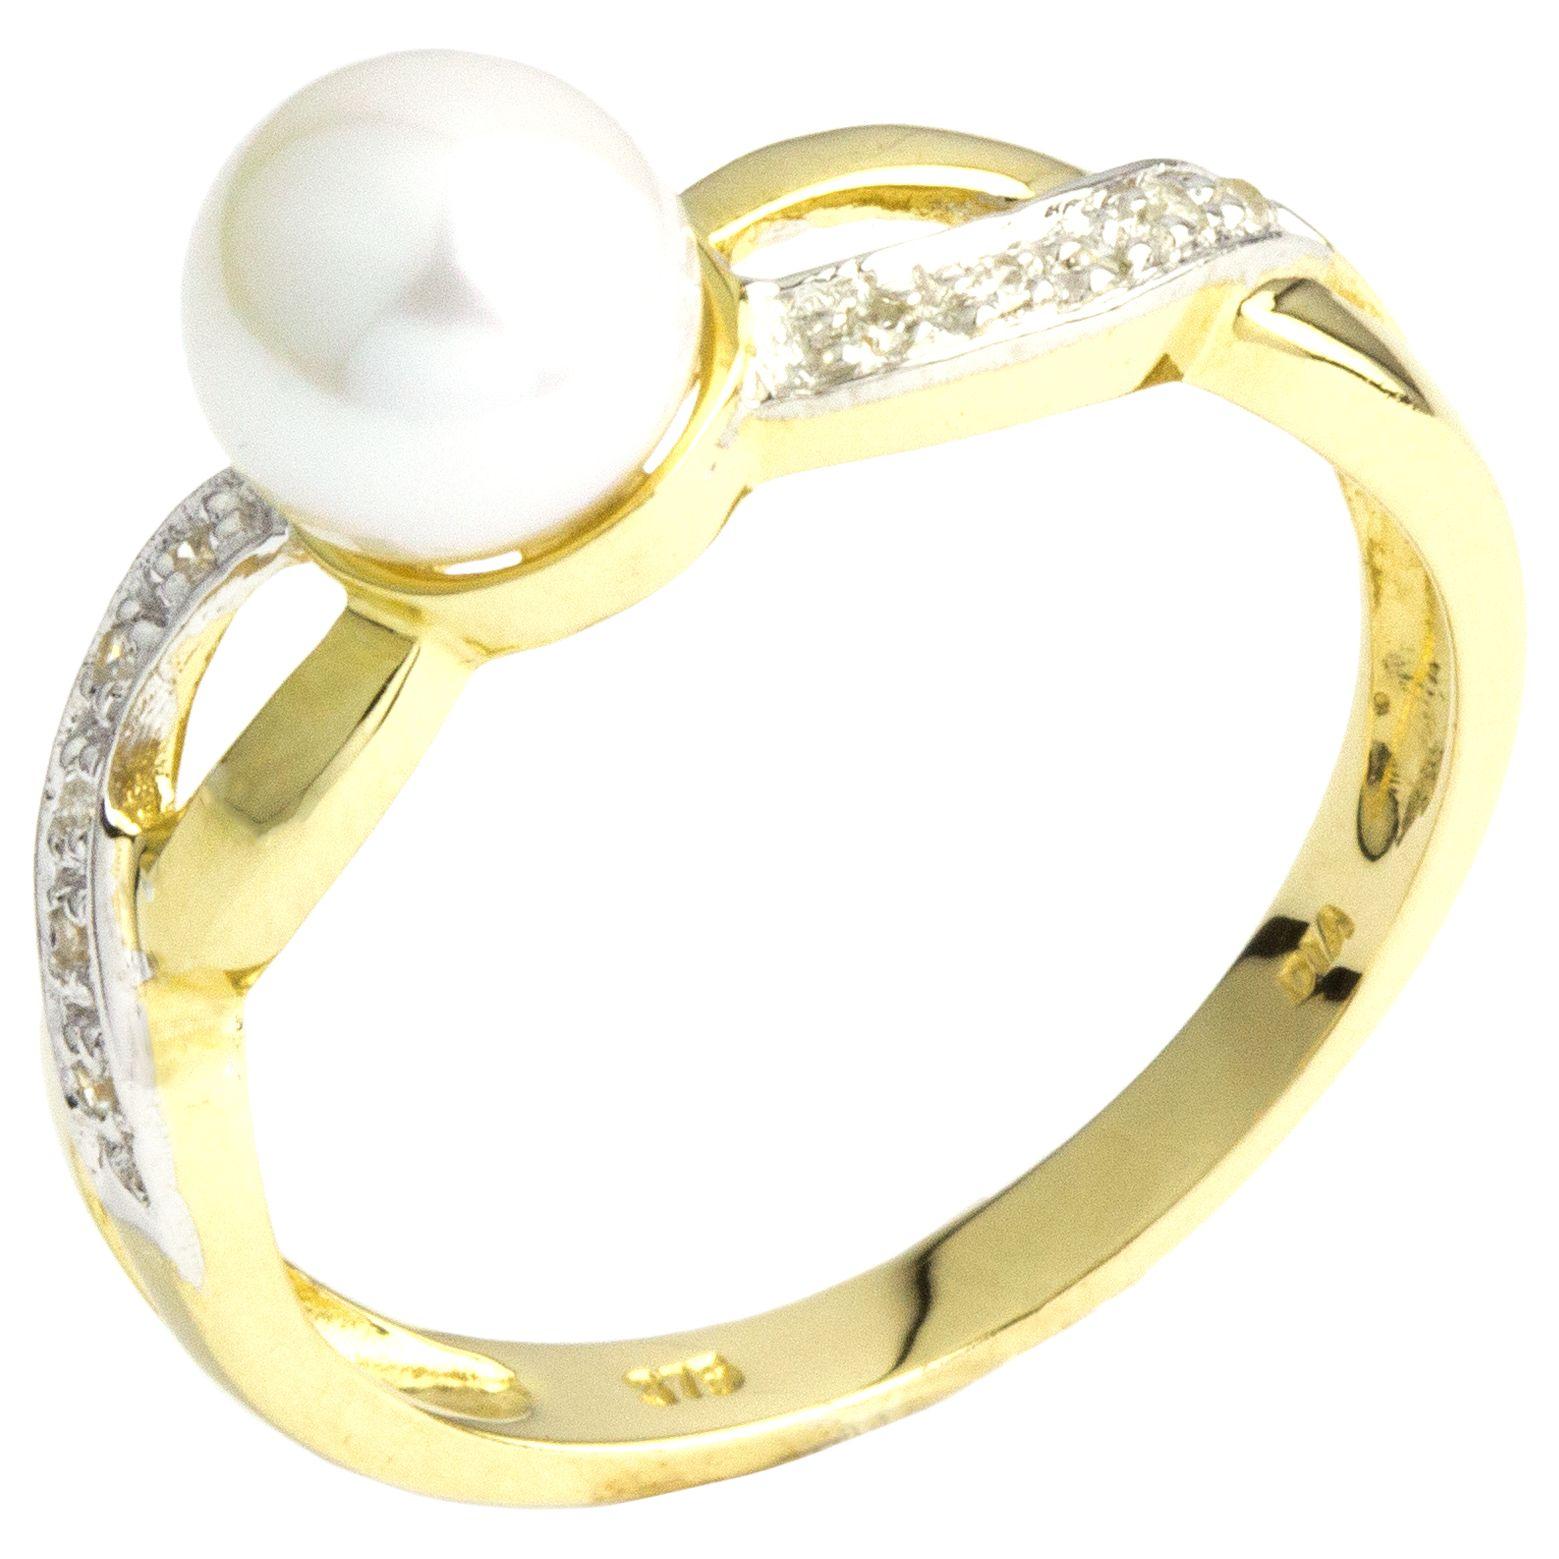 A B Davis A B Davis 9ct Gold Double Twist Diamond and Pearl Ring, Gold/White